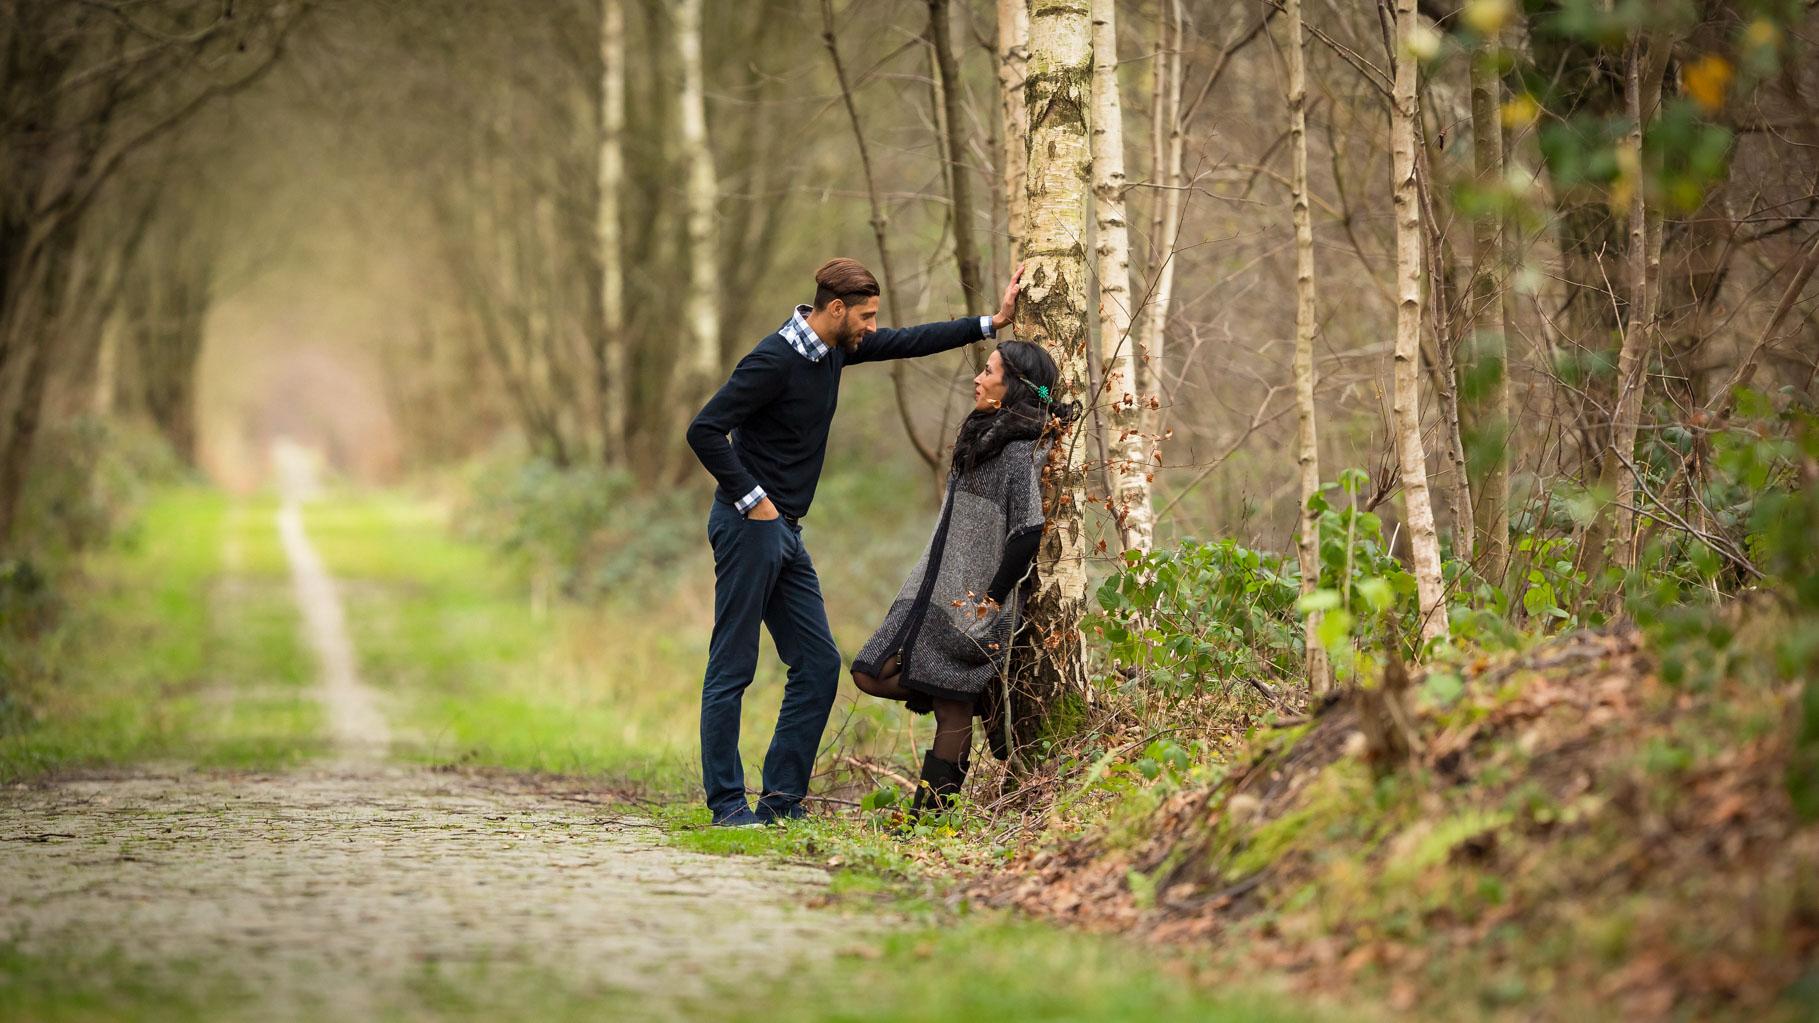 seance-photo-couple-5.jpg